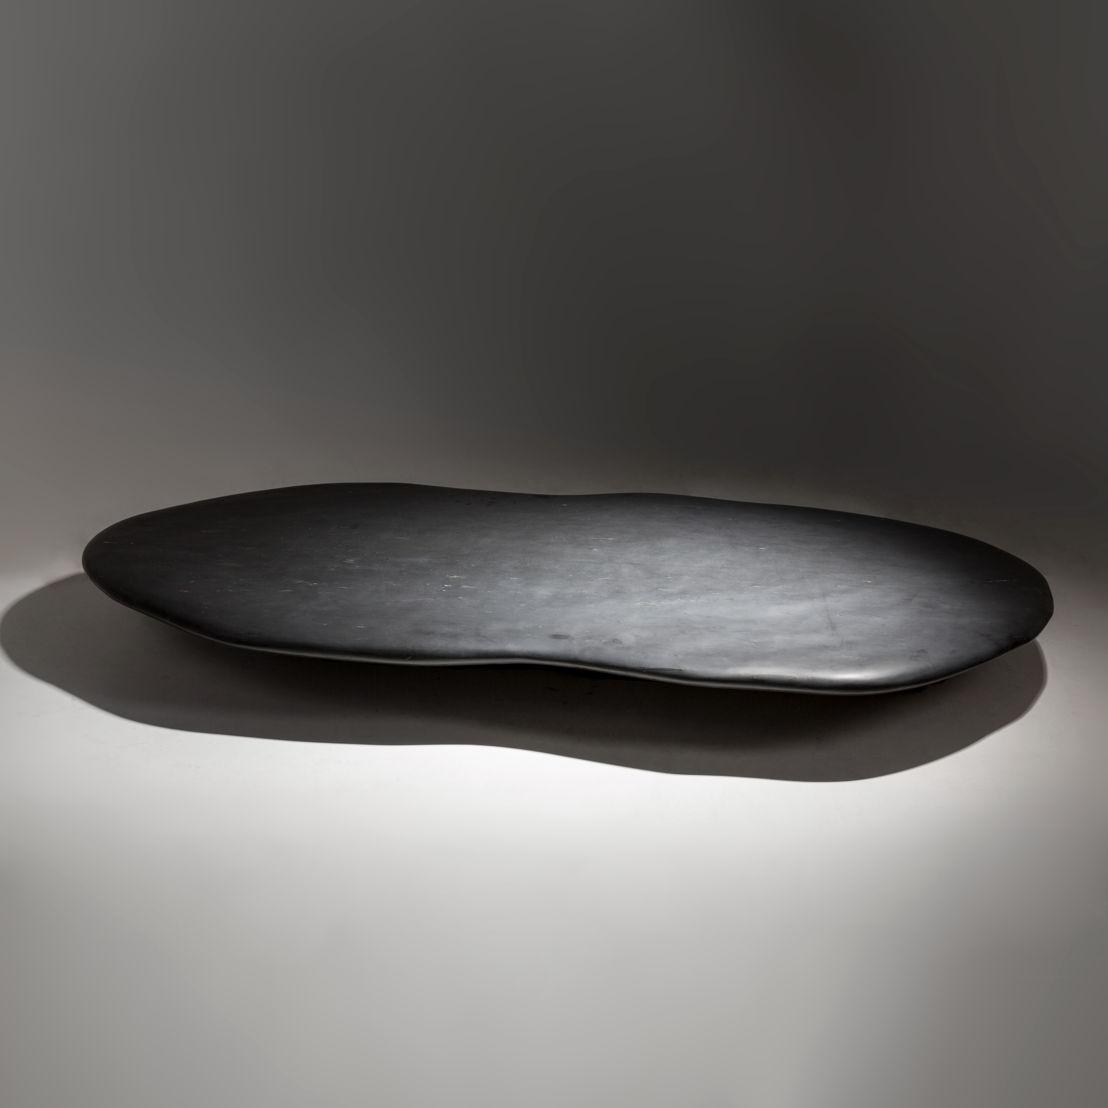 Axel Vervoordt - Floating Stone